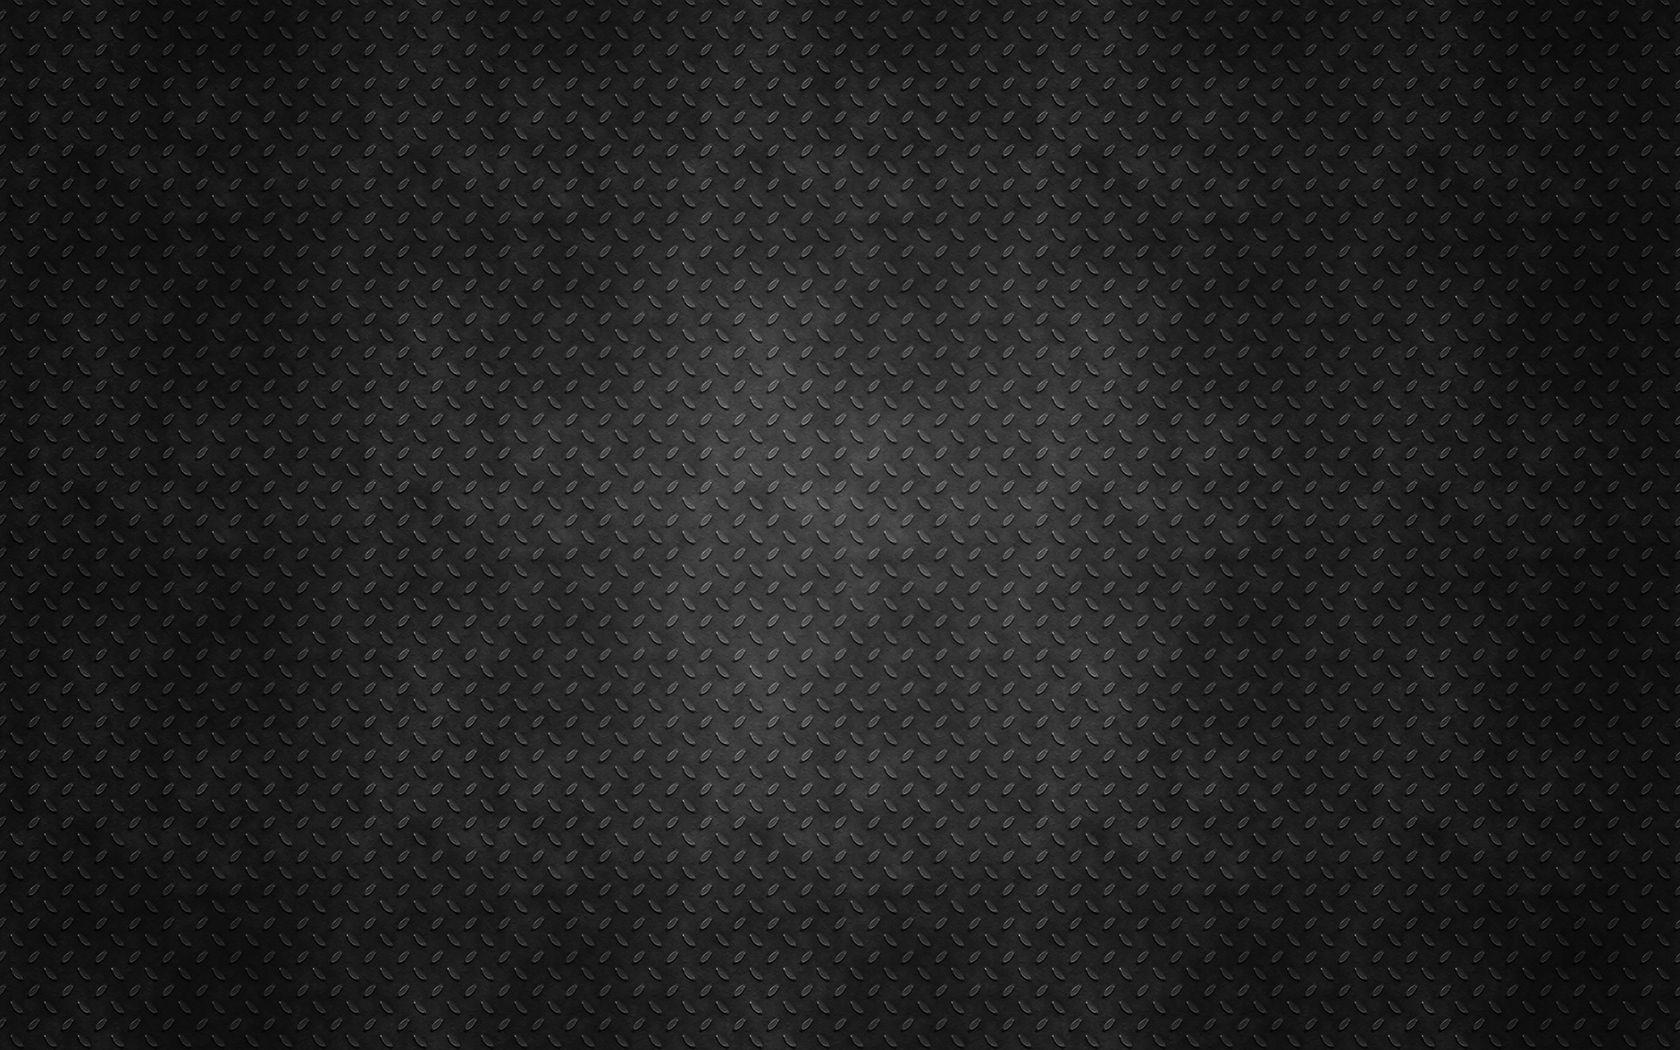 Textured Wallpaper Phoneypreachers Black Metal Textured Background Abstract Wallpaper Black Textured Wallpaper Textured Wallpaper Metallic Wallpaper